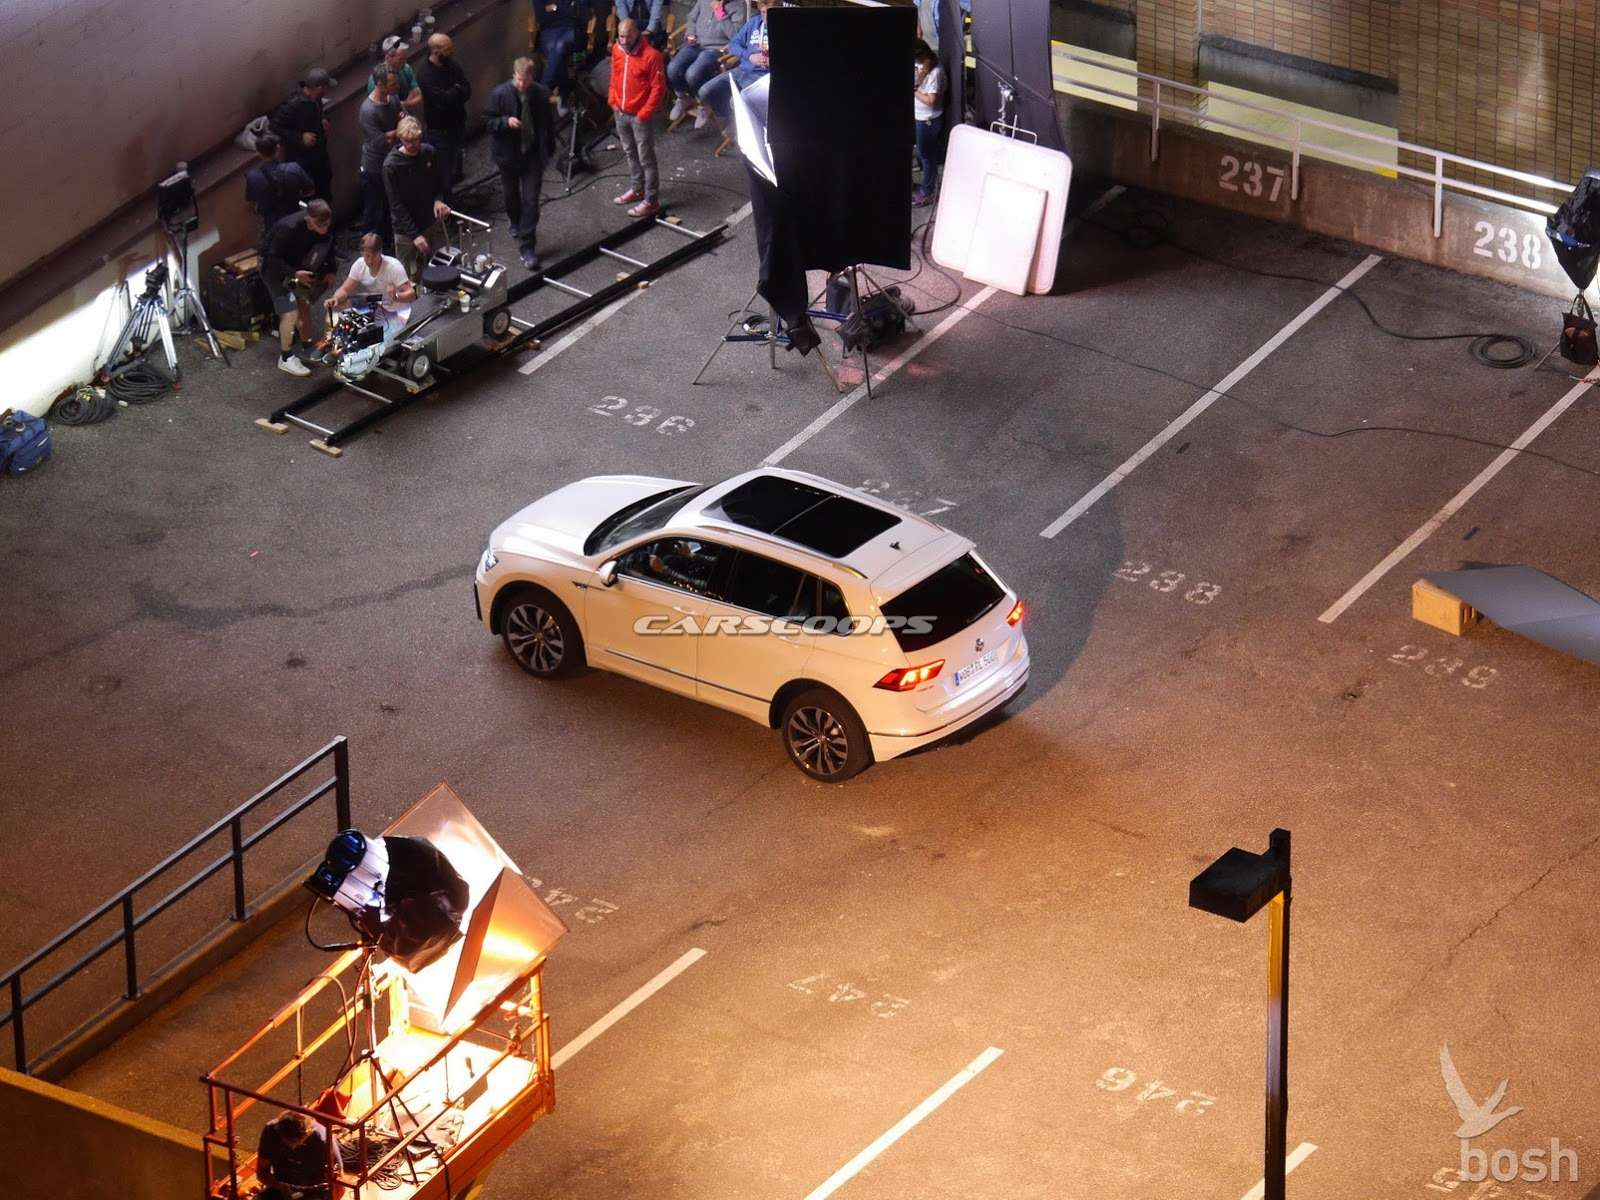 2017-VW-Tiguan-Carscoops2